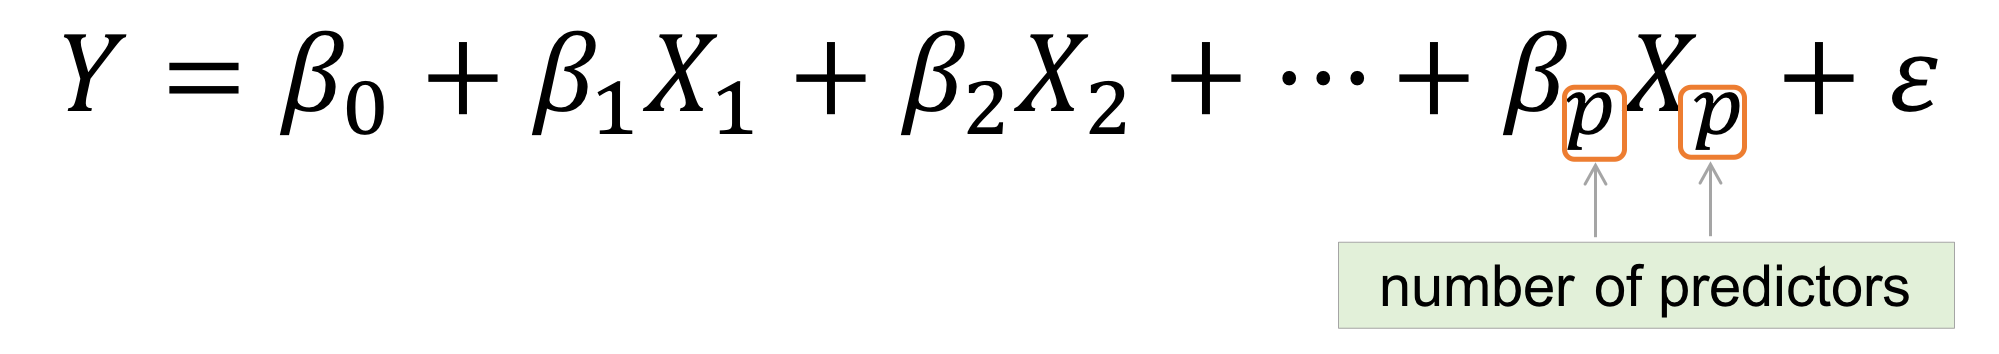 mlr-formula-general